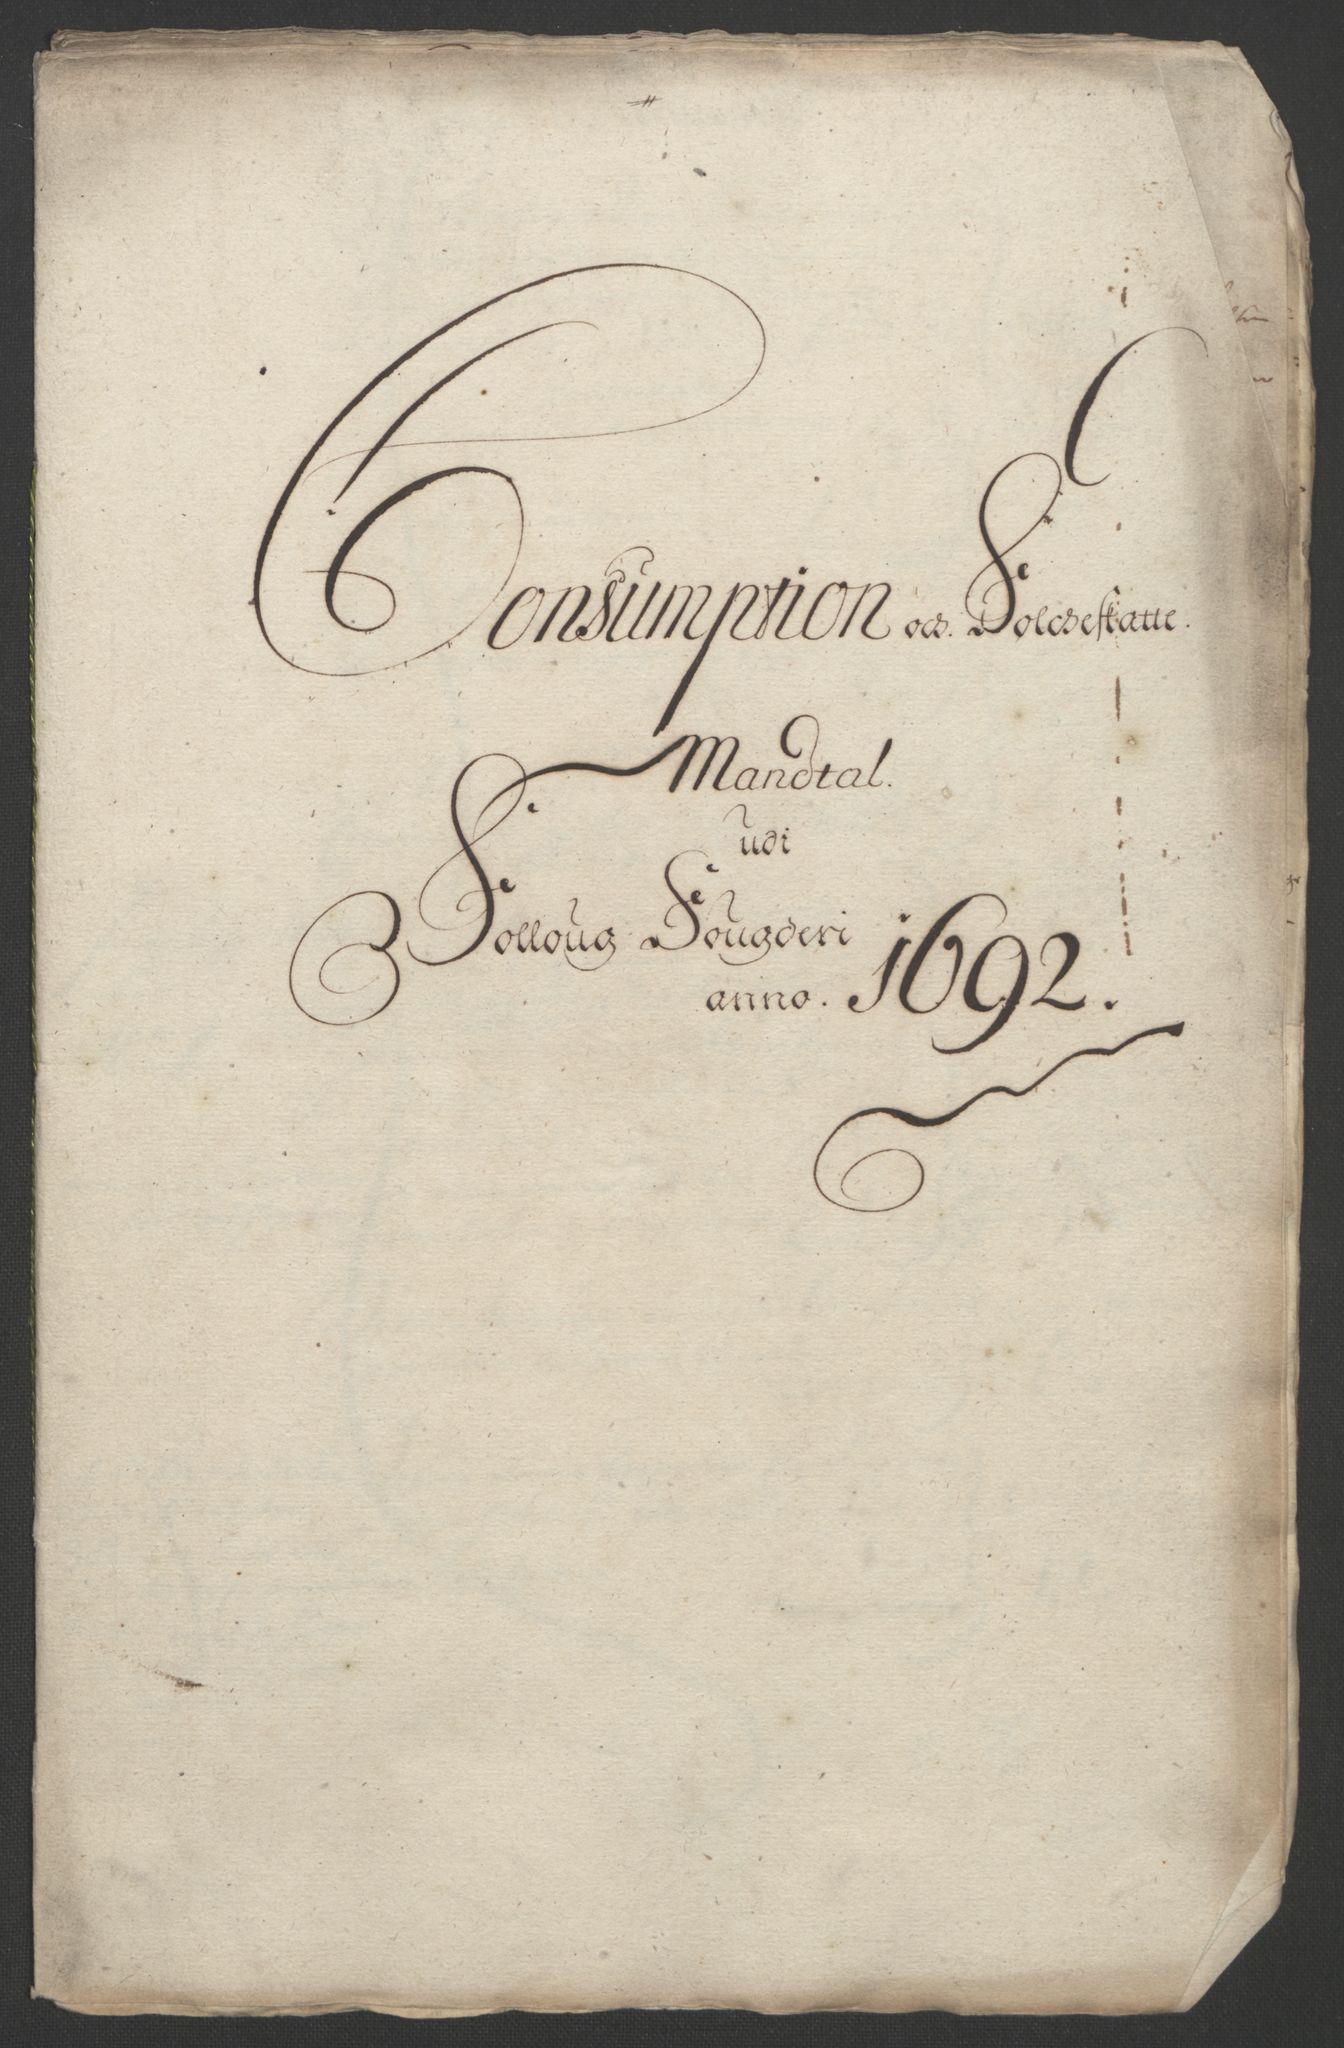 RA, Rentekammeret inntil 1814, Reviderte regnskaper, Fogderegnskap, R09/L0437: Fogderegnskap Follo, 1692-1693, s. 155